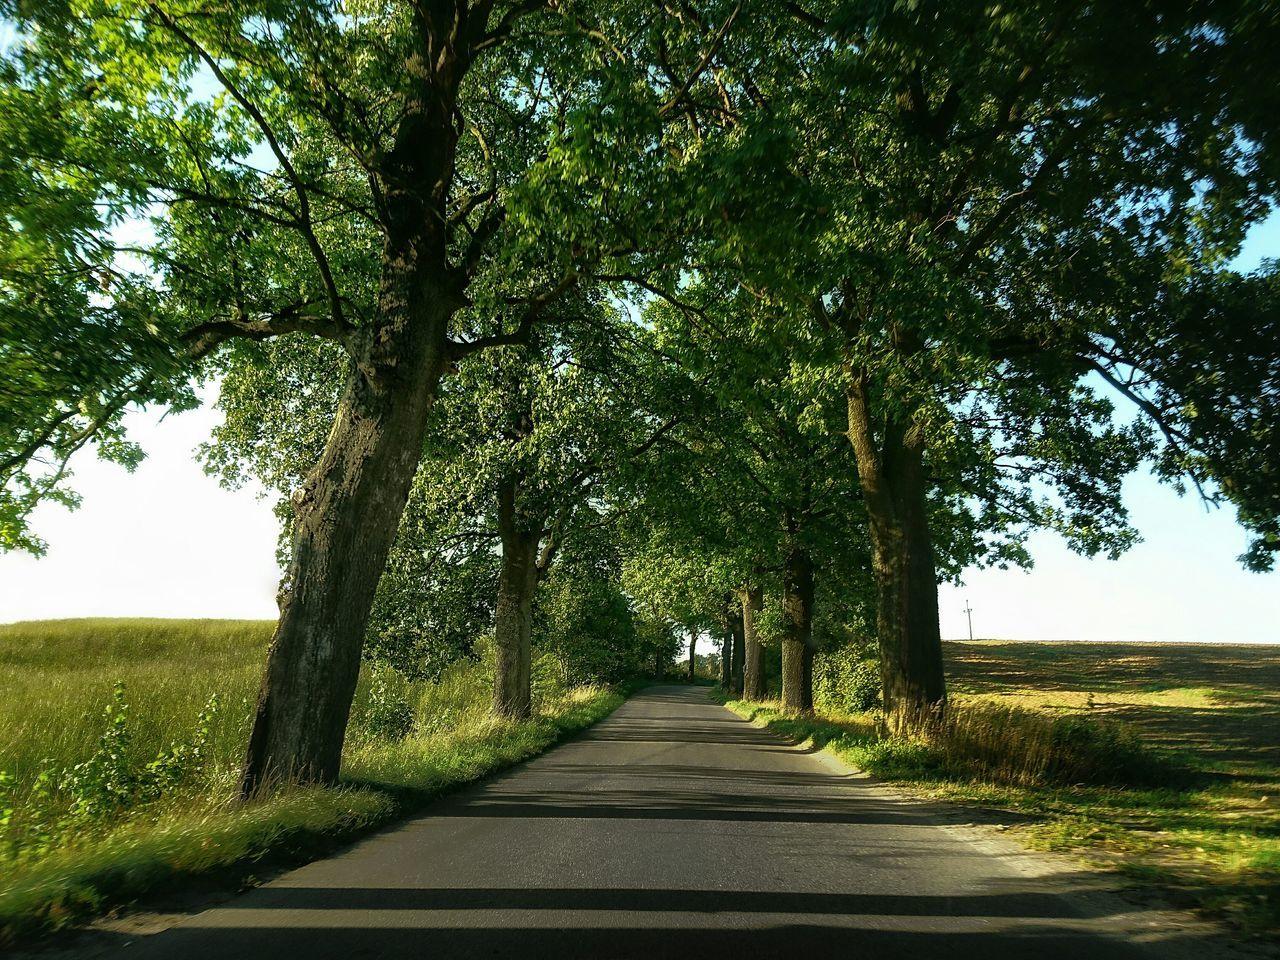 Road Tree Growth Green Color Day Nature Green Road Droga Long Poland Warmia Masuria Summer